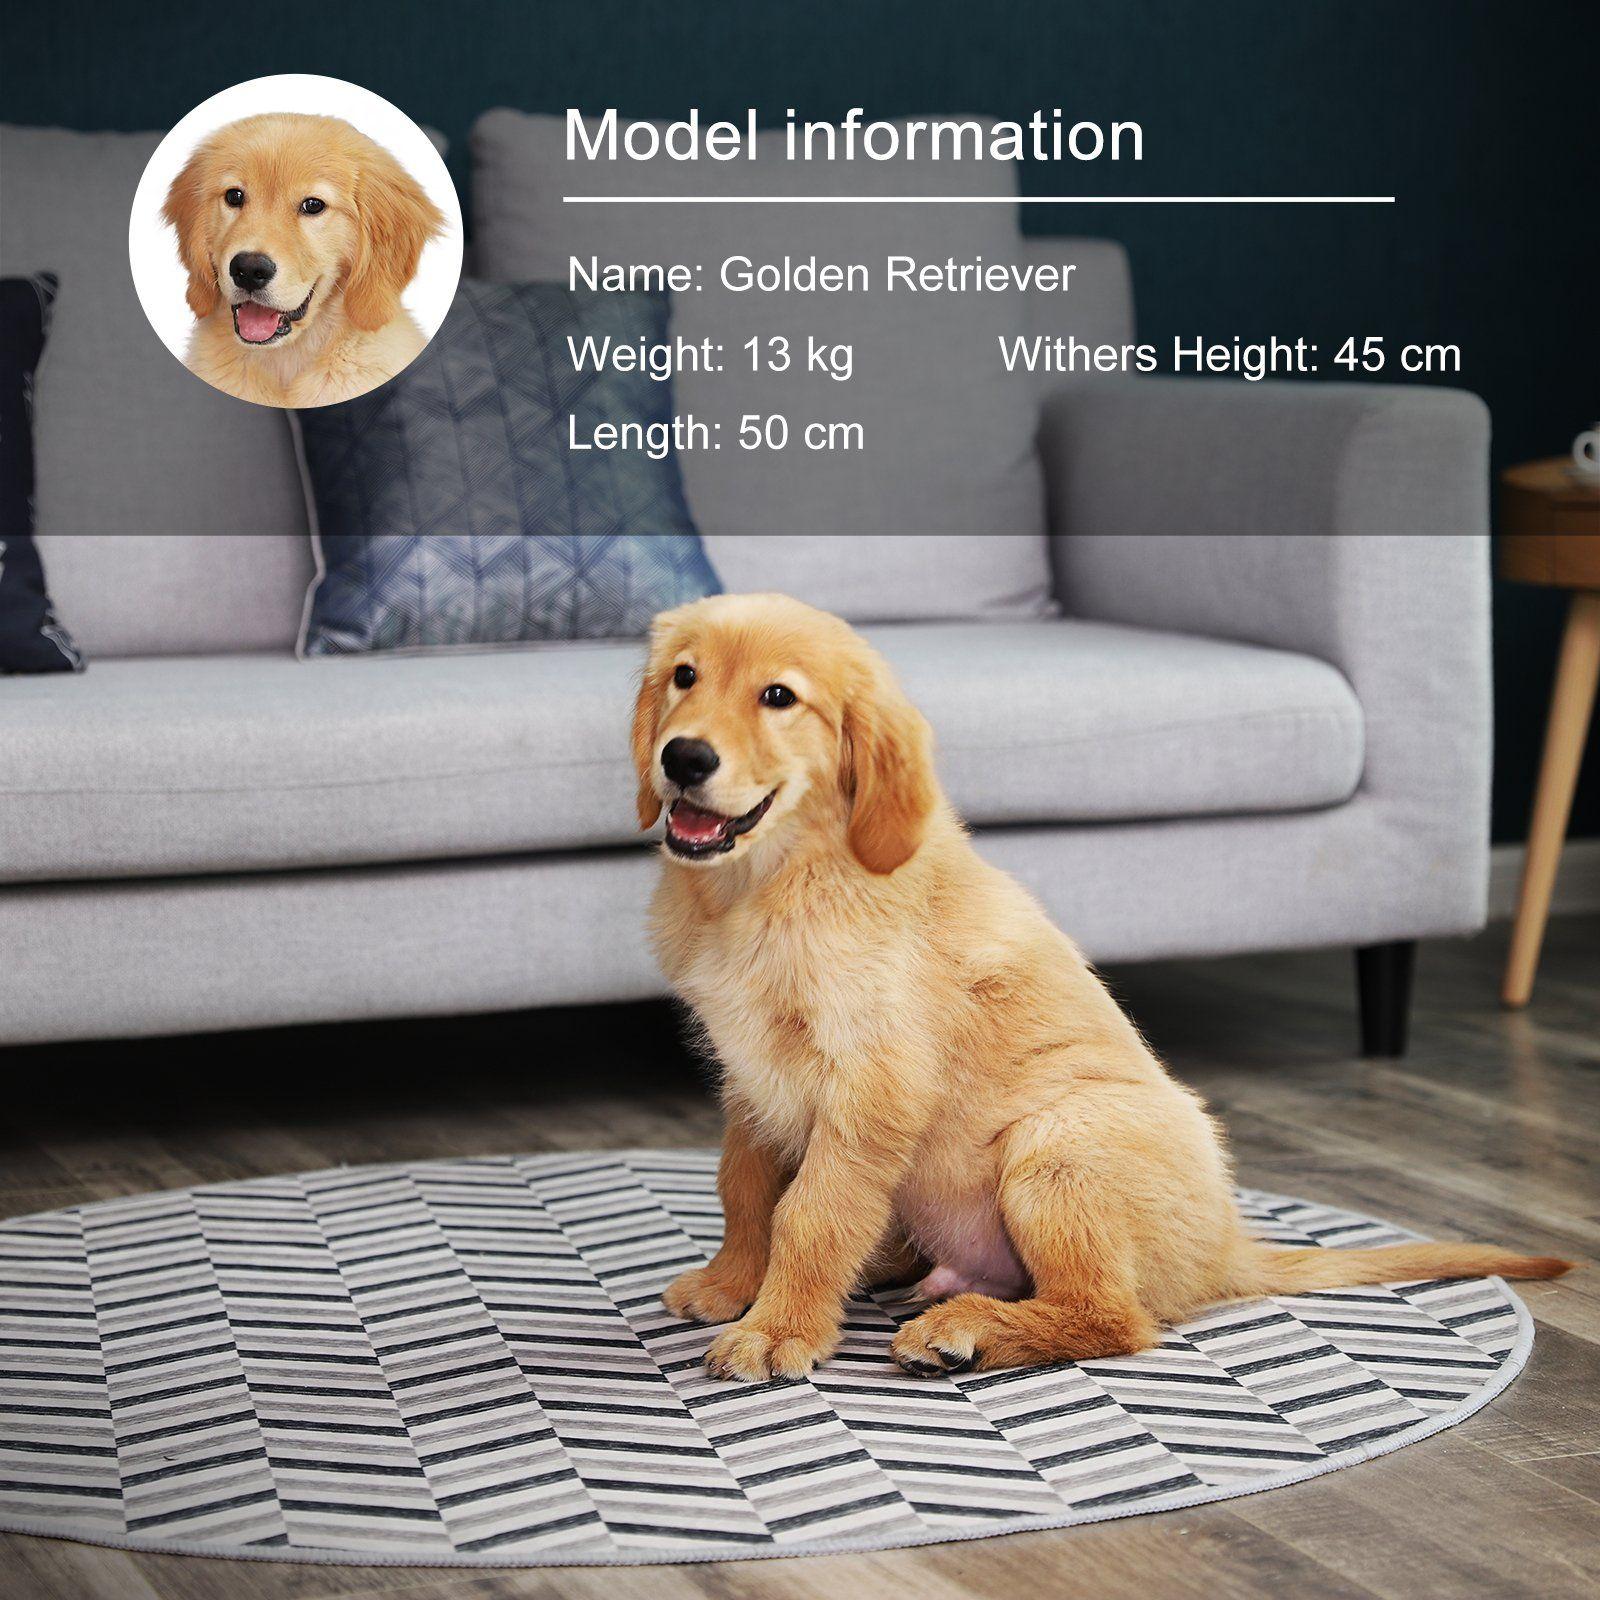 Songmics Plush Dog Bed Sofa With Detachable And Machine Washable